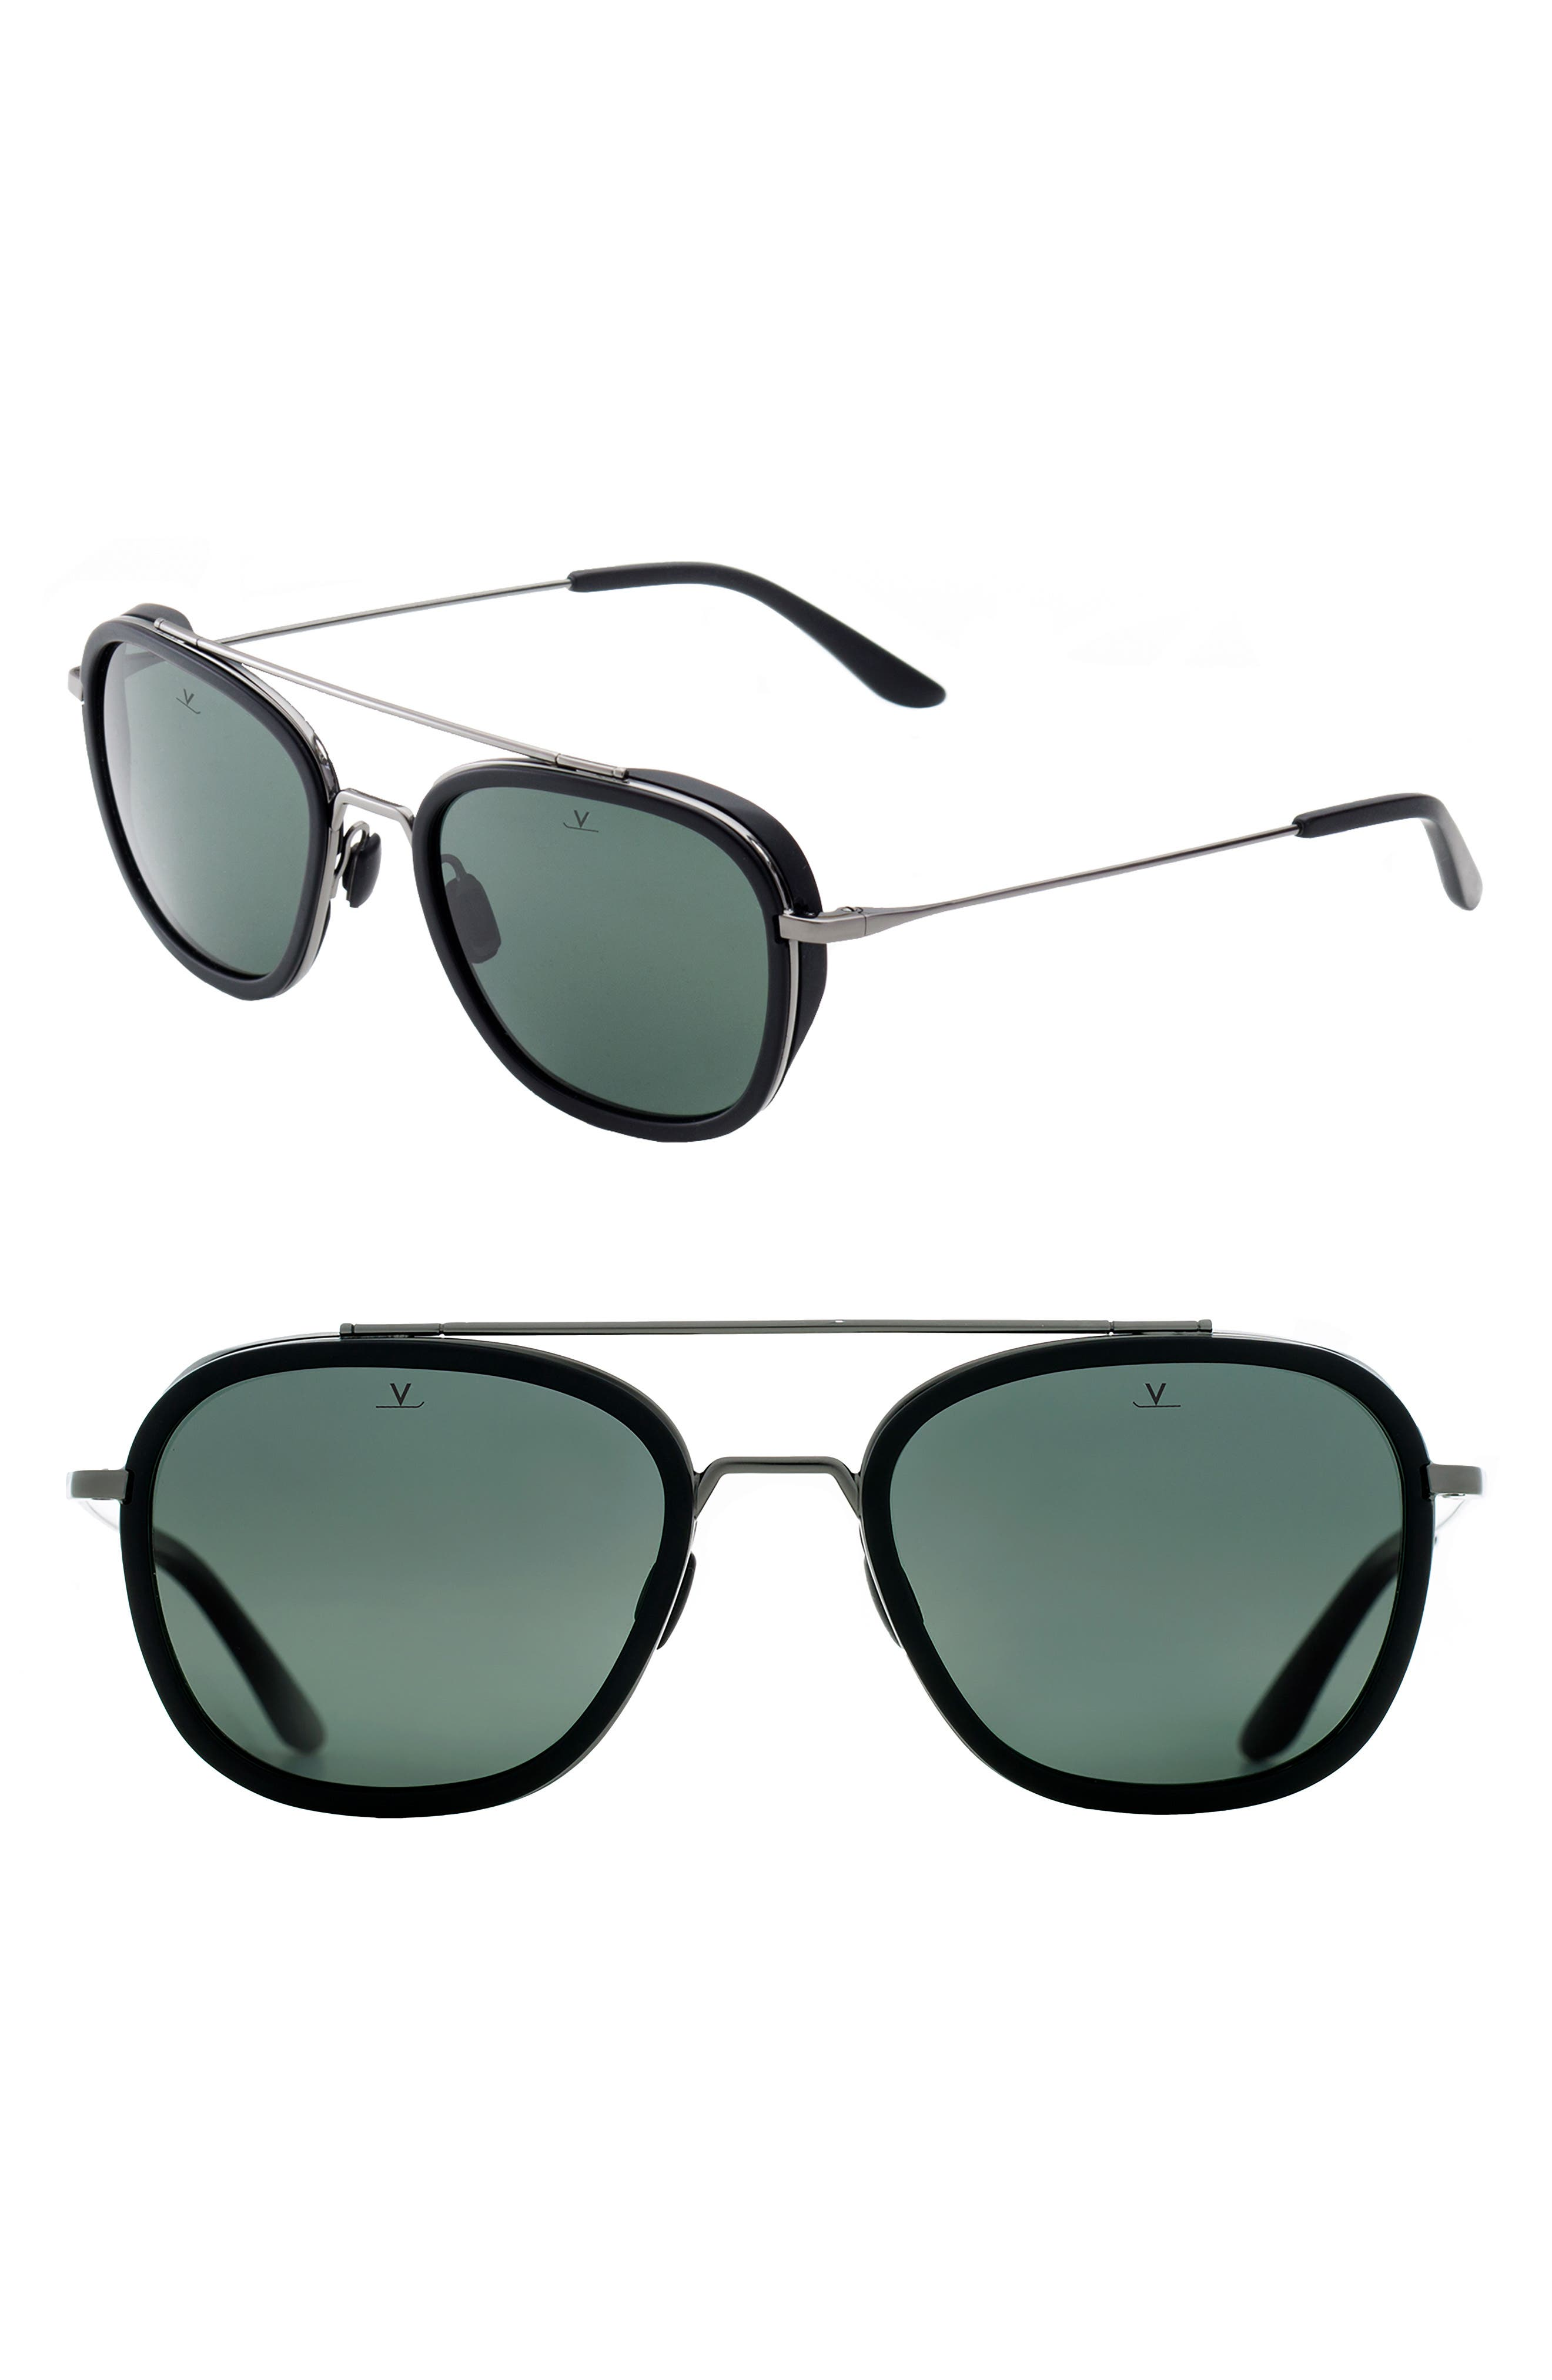 Glacier 54mm Polarized Aviator Sunglasses,                             Main thumbnail 1, color,                             MATT BLACK/ GUNMETAL